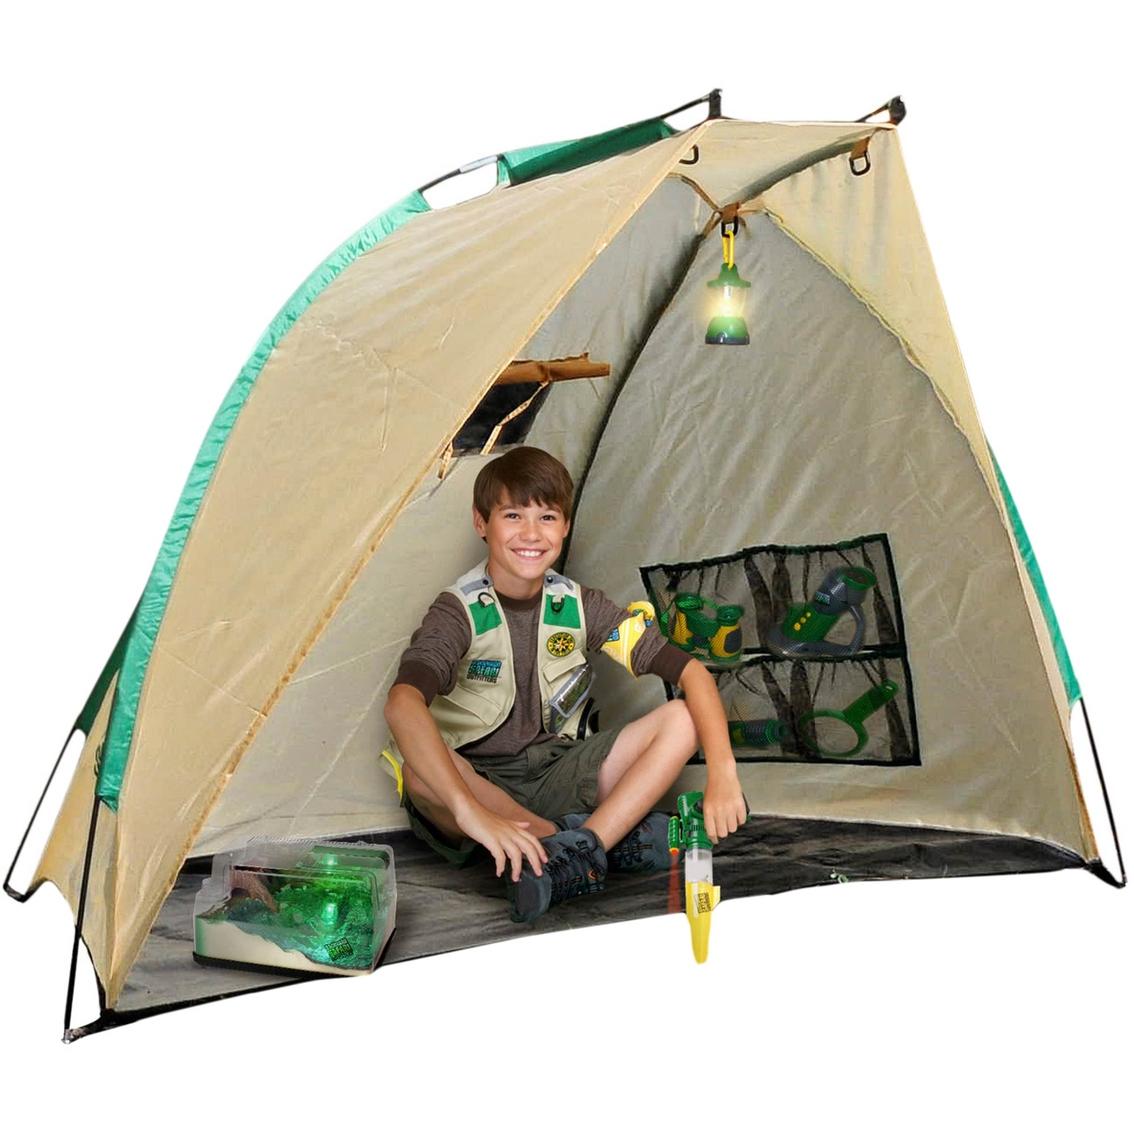 Backyard Safari Toys backyard safari base camp shelter | playhouses | baby & toys | shop